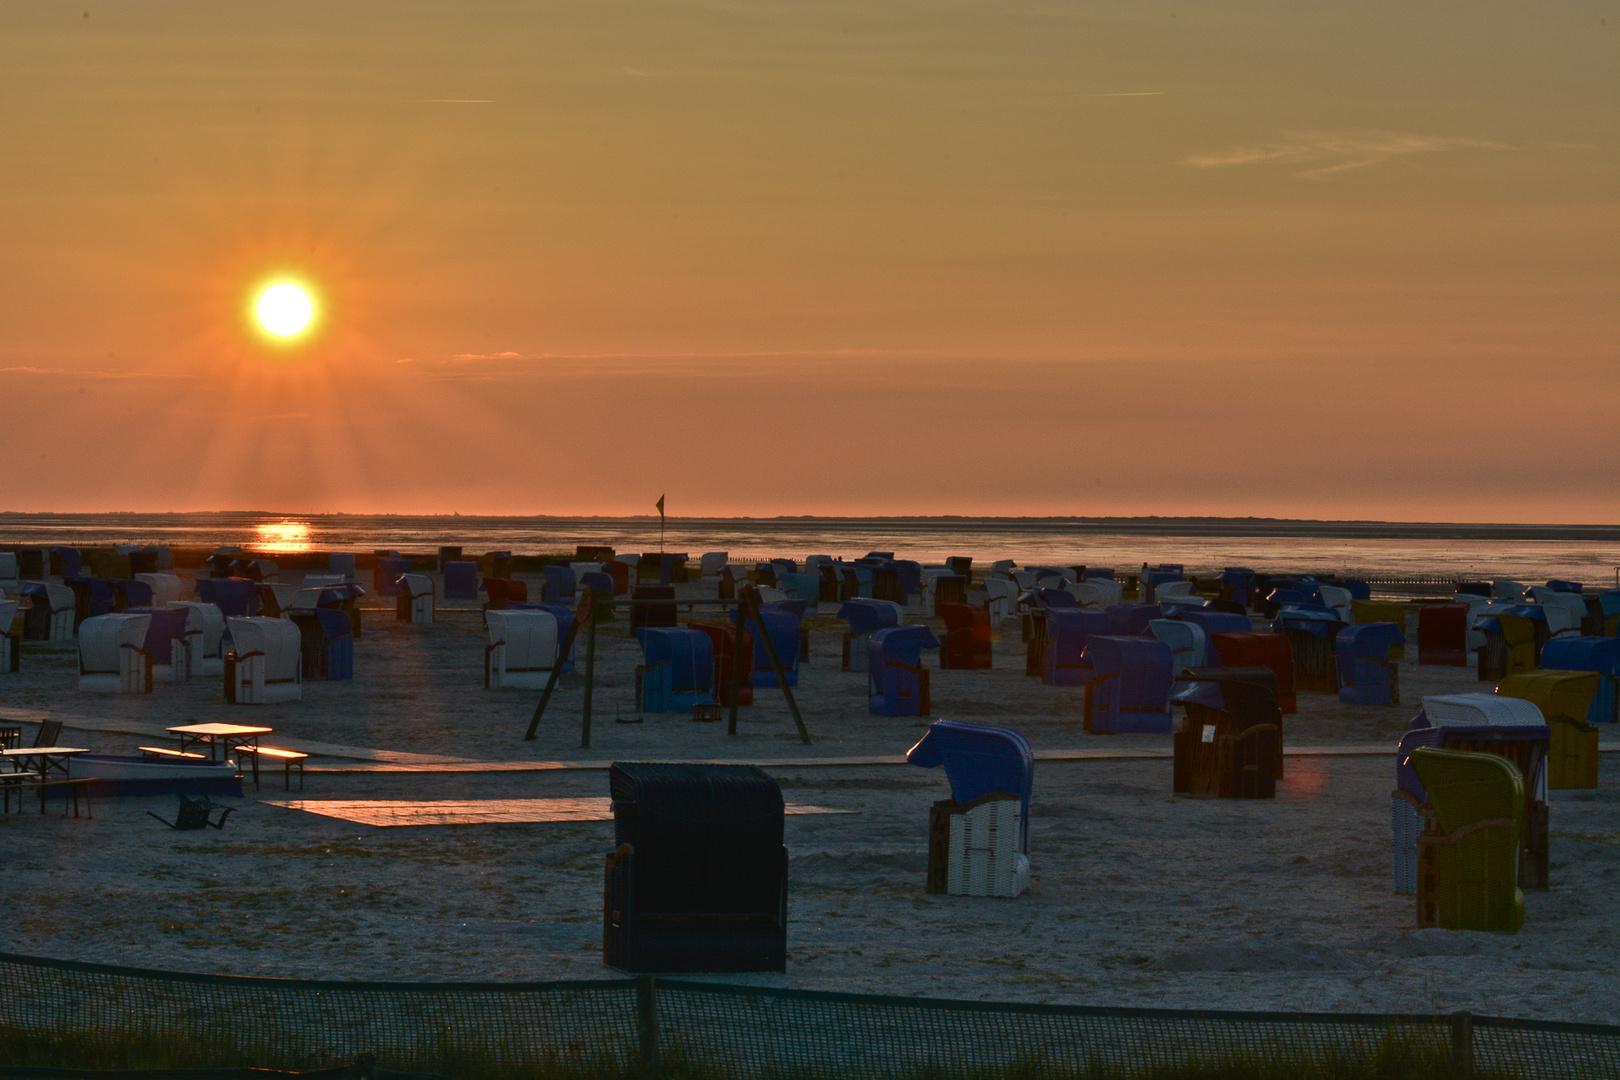 Sonnenuntergang über dem Strand...